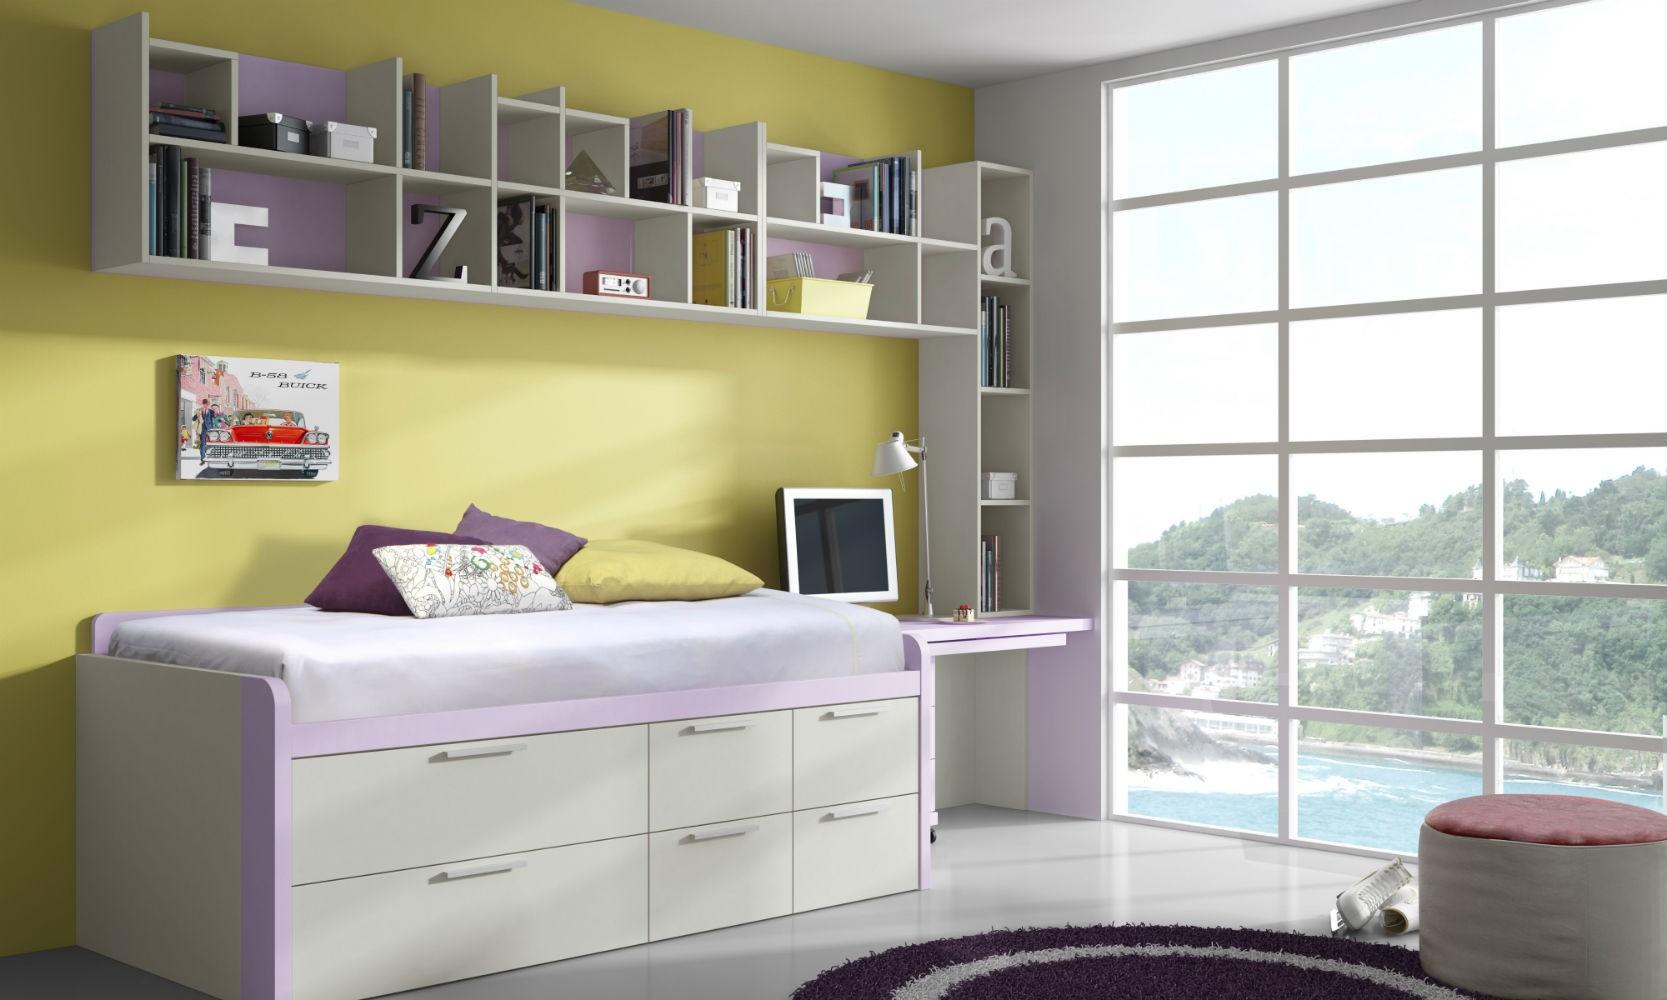 Dormitorio infantil juvenil moderno muebles valencia for Muebles valencia